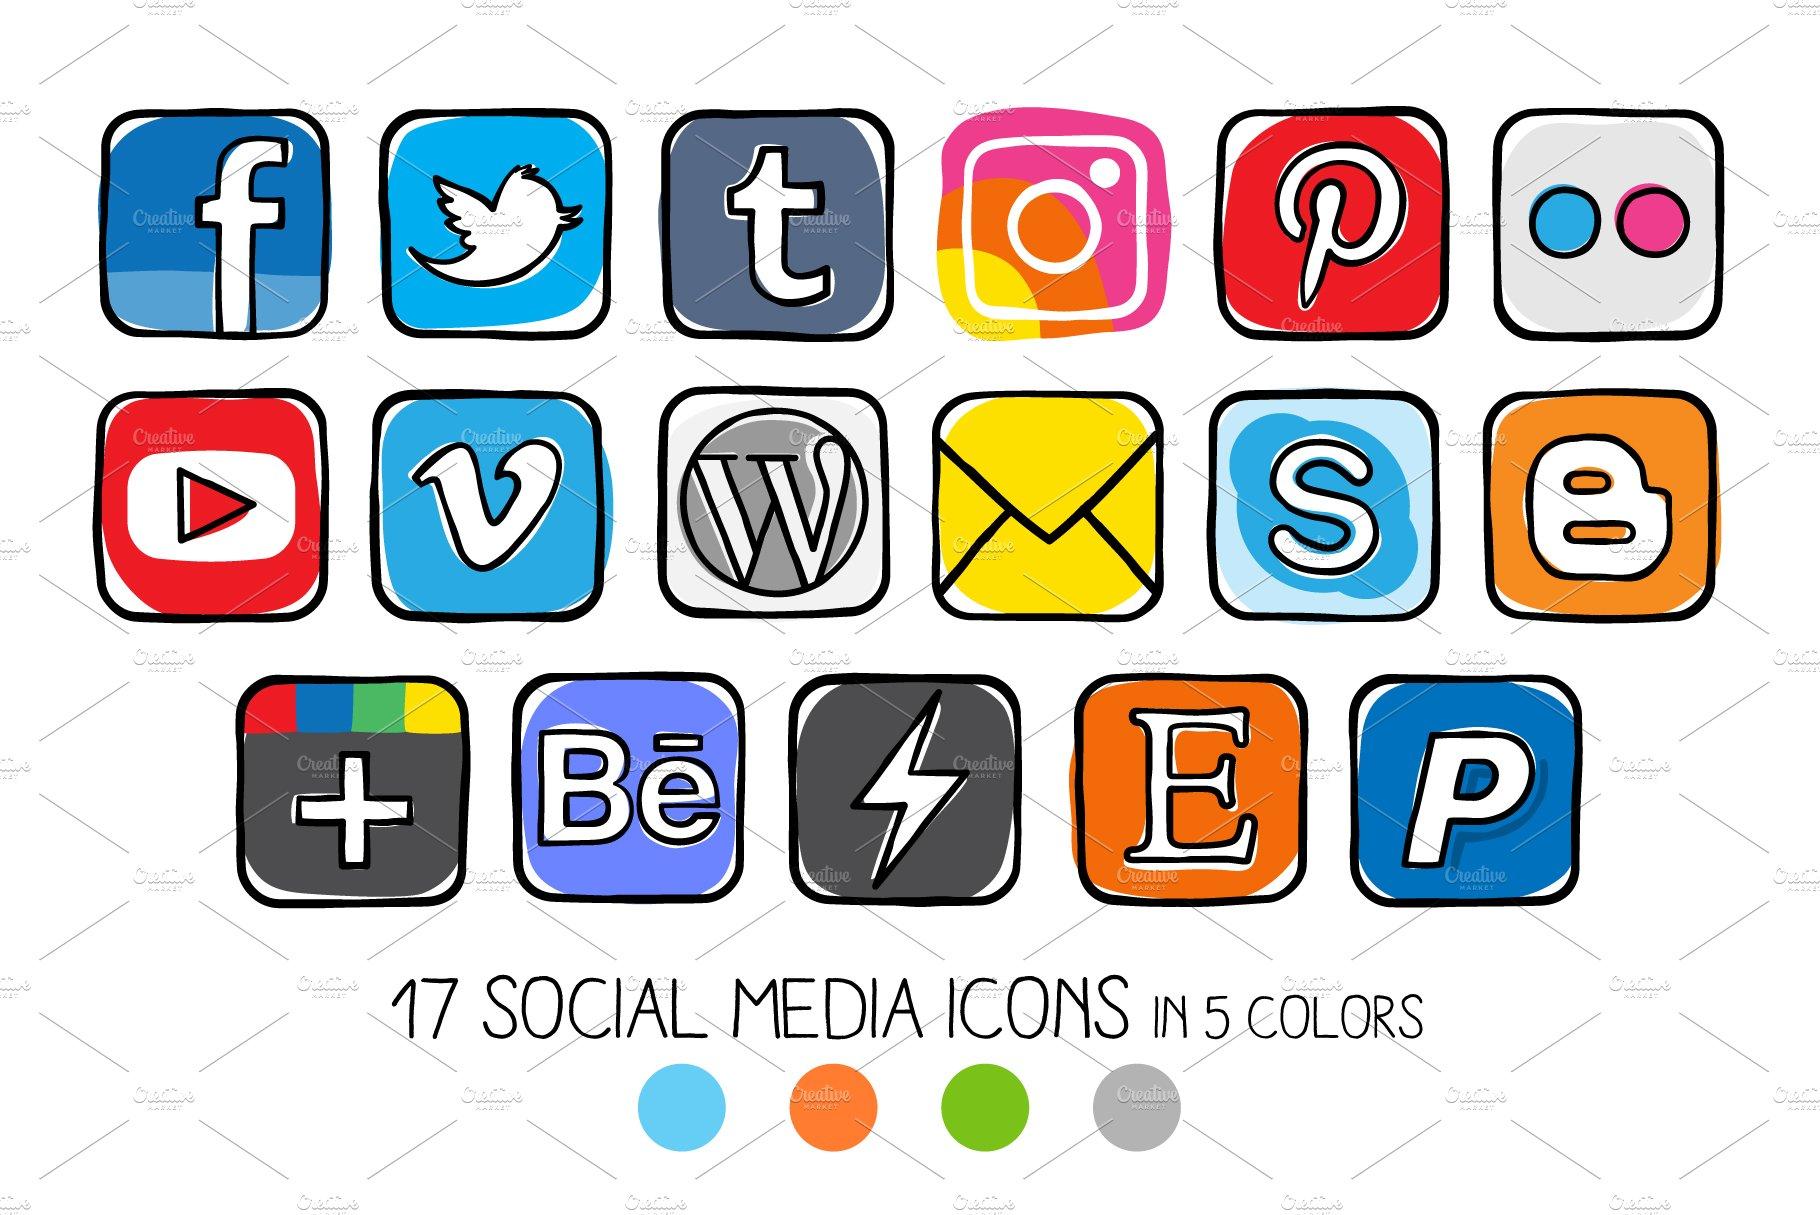 VECTOR - Guache social media icons ~ Icons ~ Creative Market